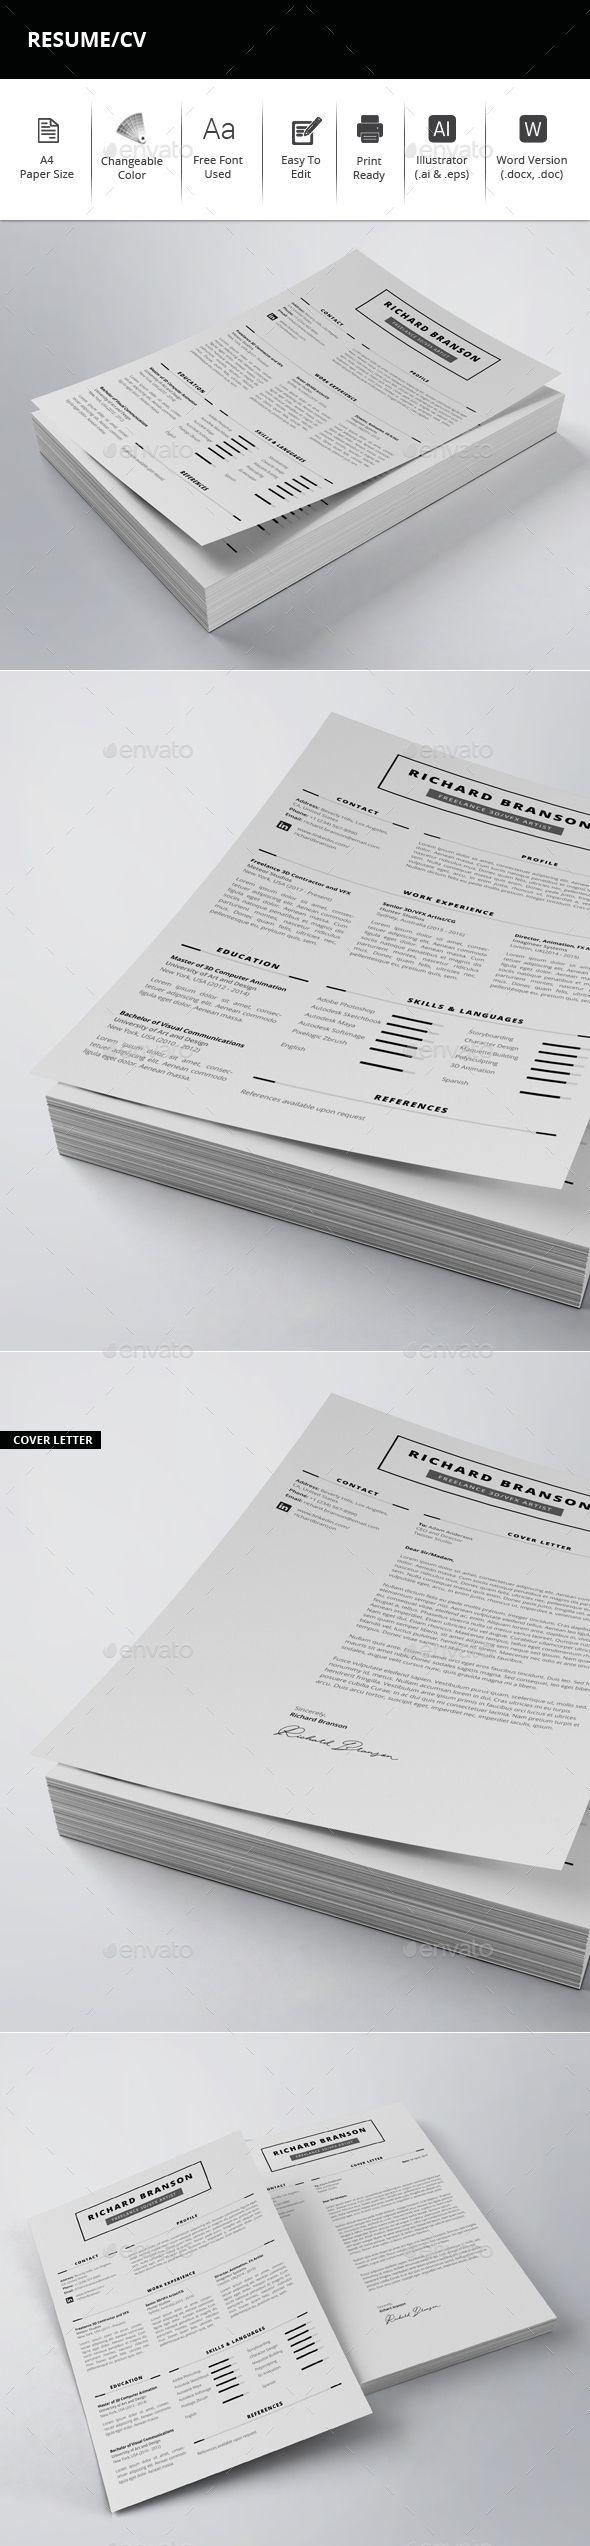 Resume/CV | CVs | Pinterest | Revistas